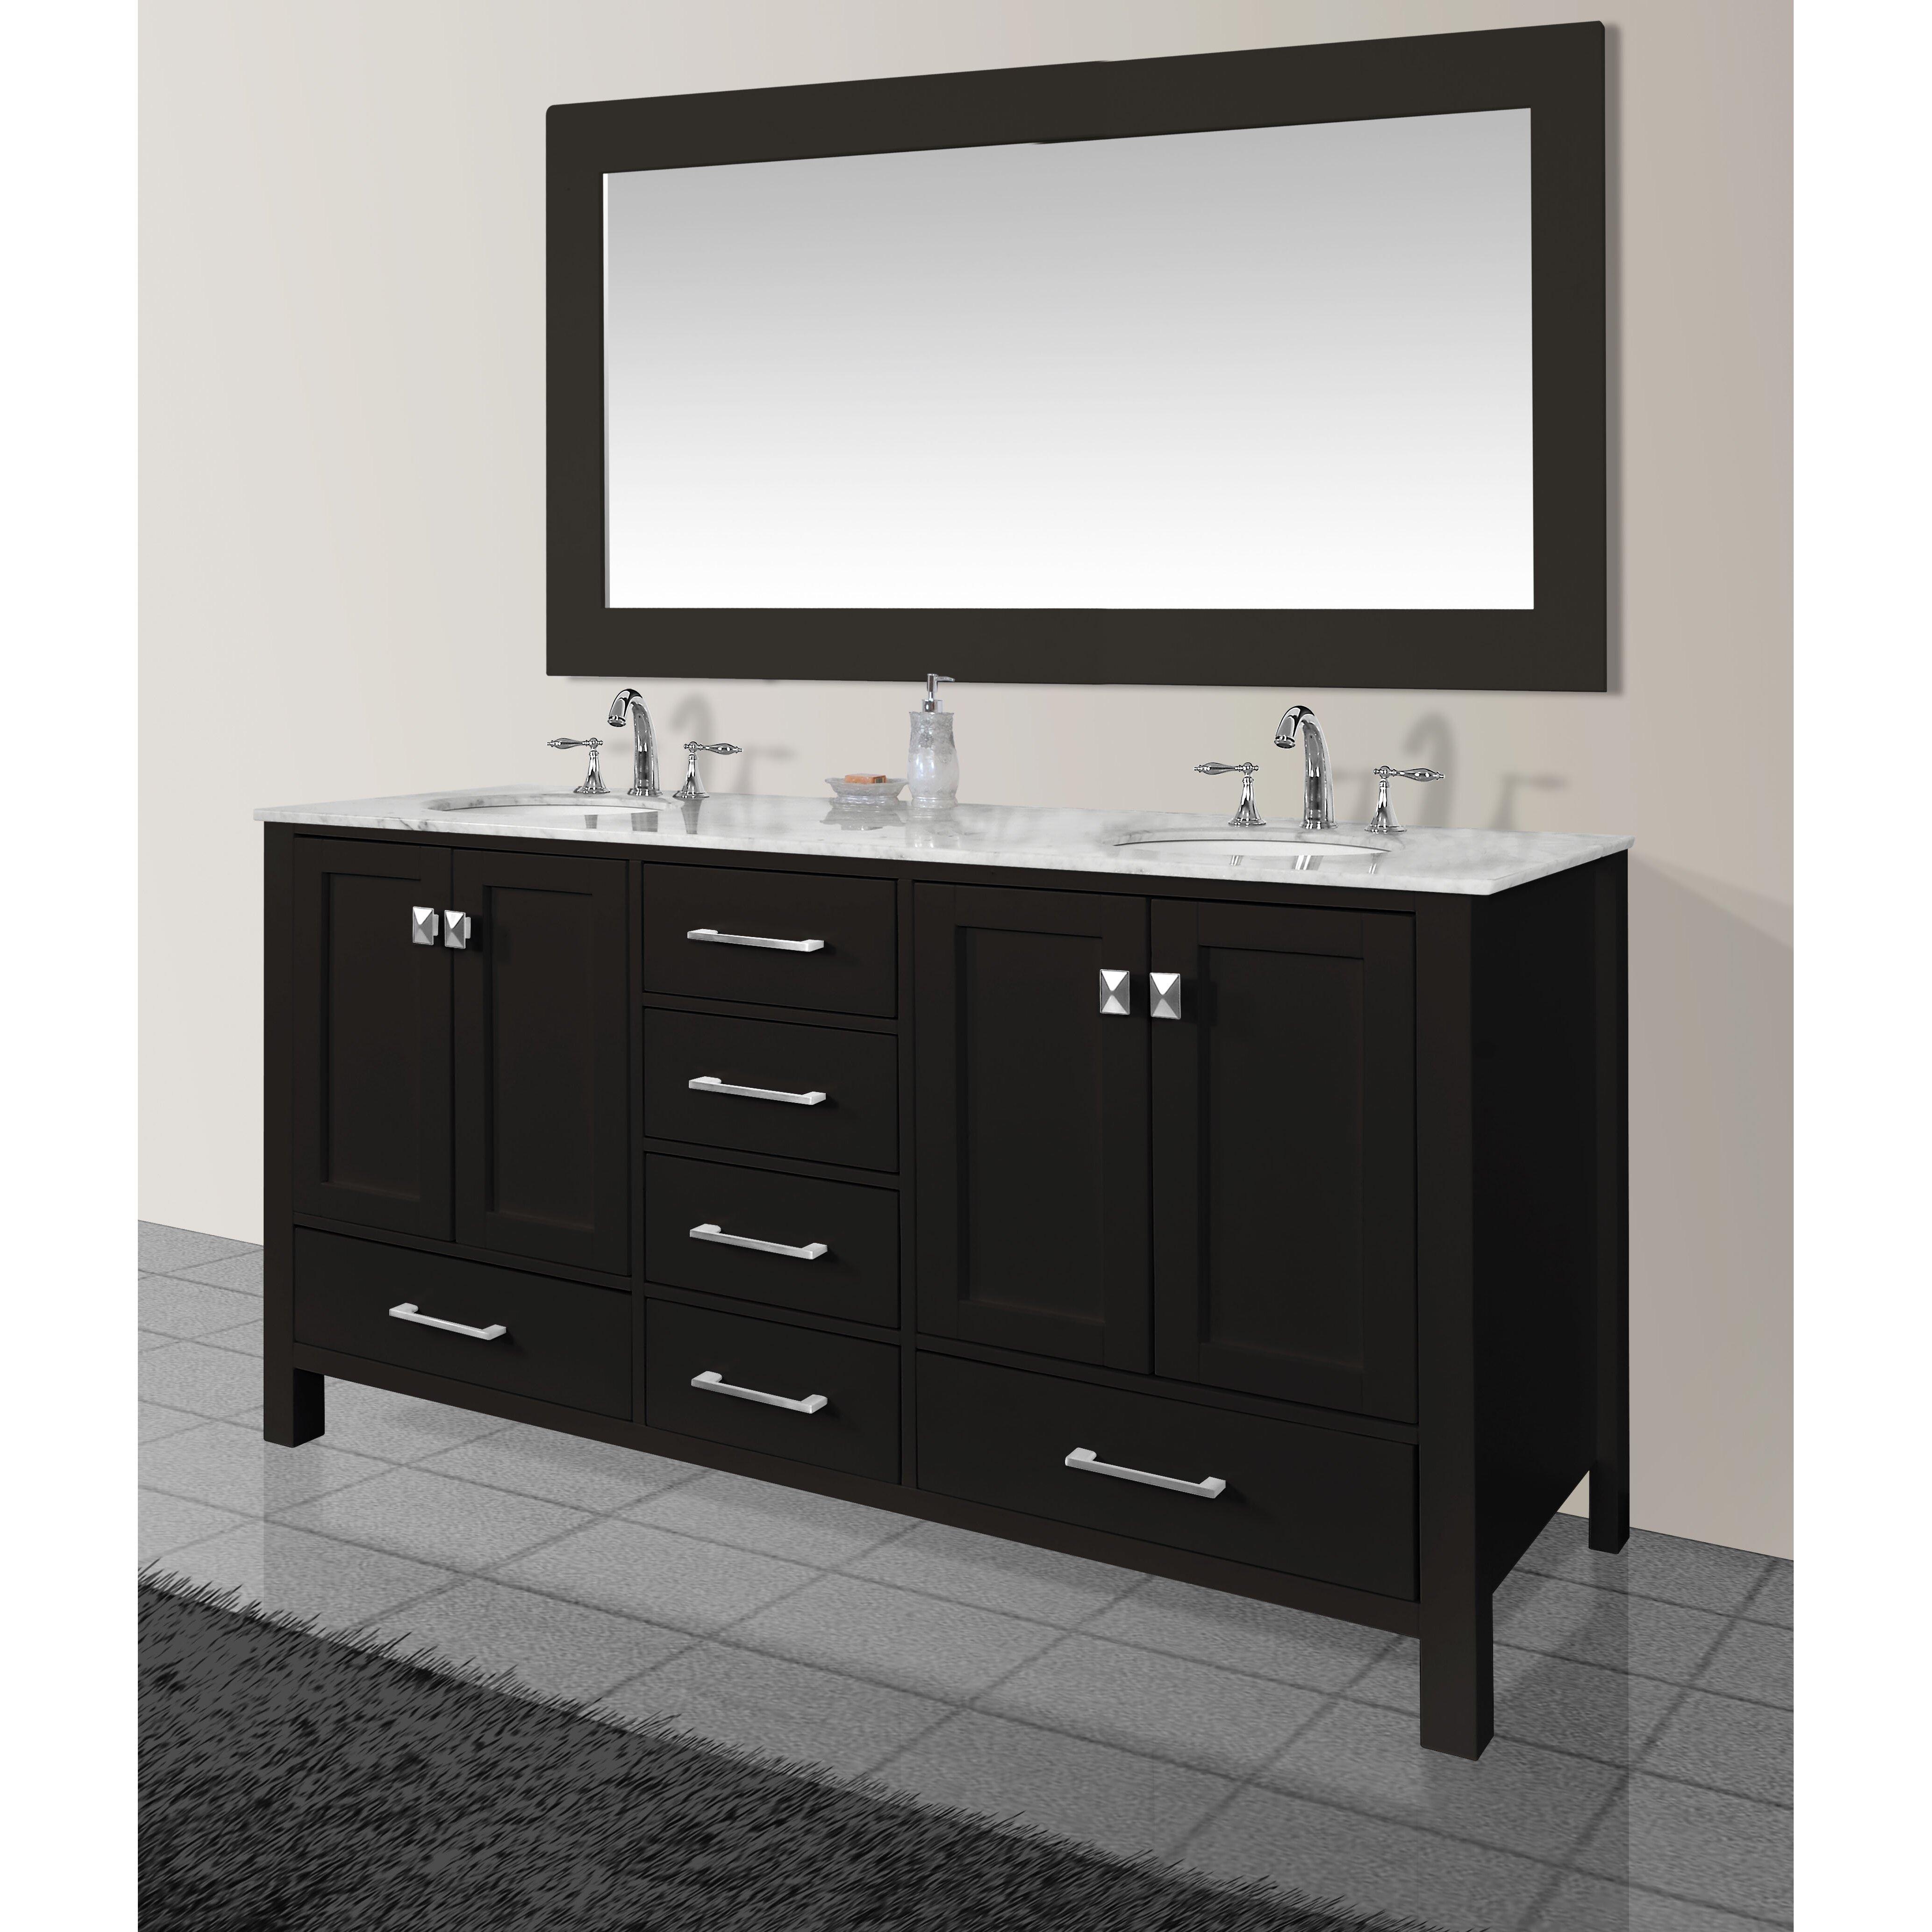 "dCOR design Embrey 72"" Double Sink Bathroom Vanity Set with Mirror &"